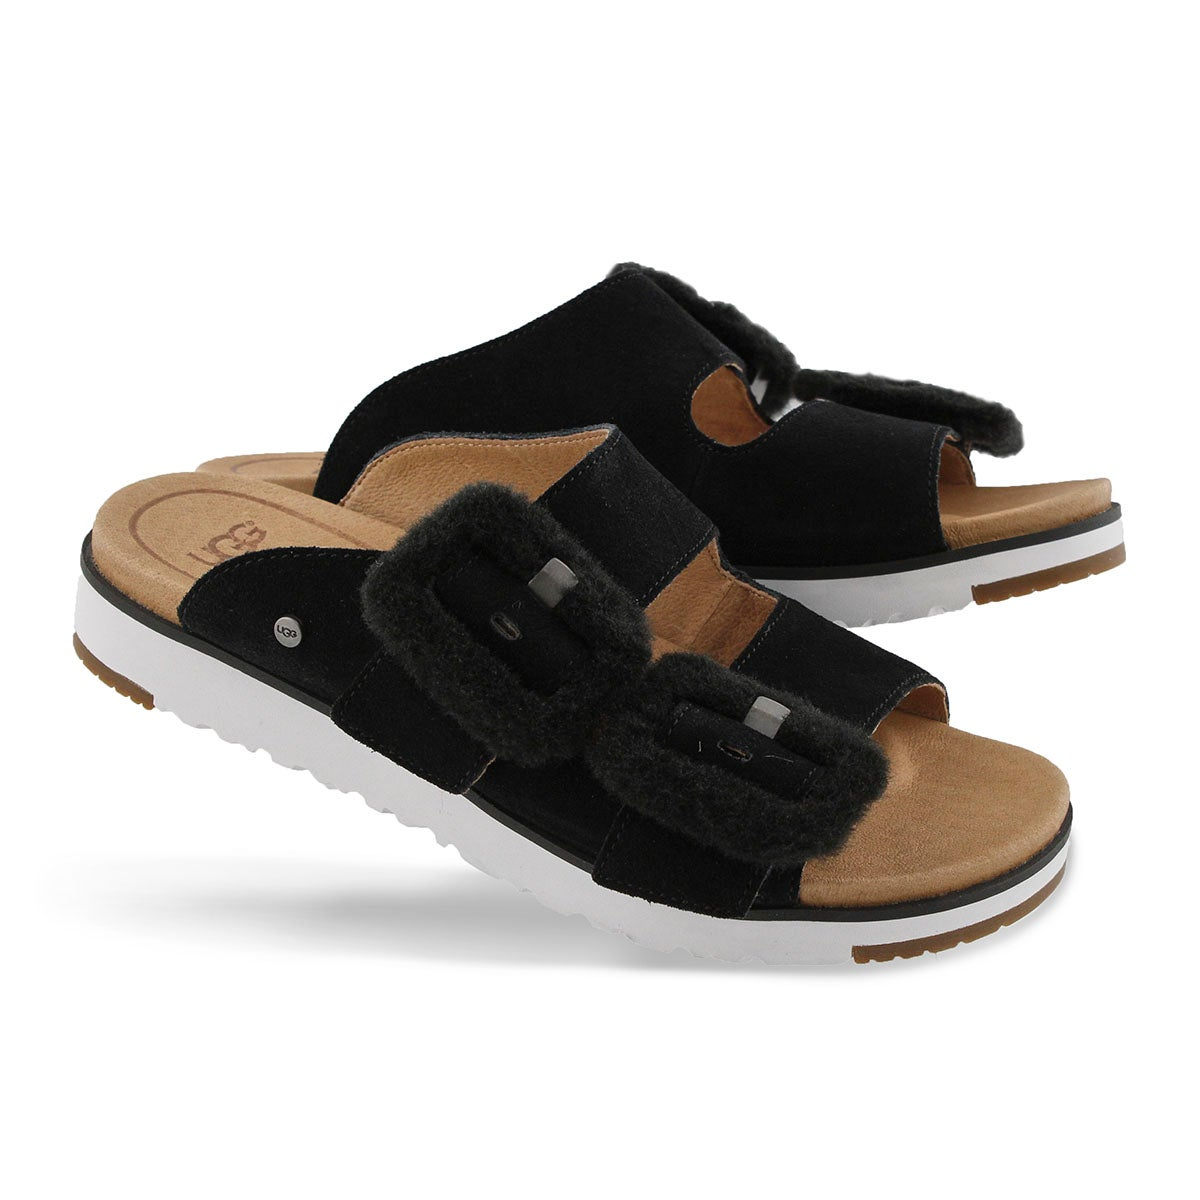 Women's FLUFF INDIO black casual slide sandals